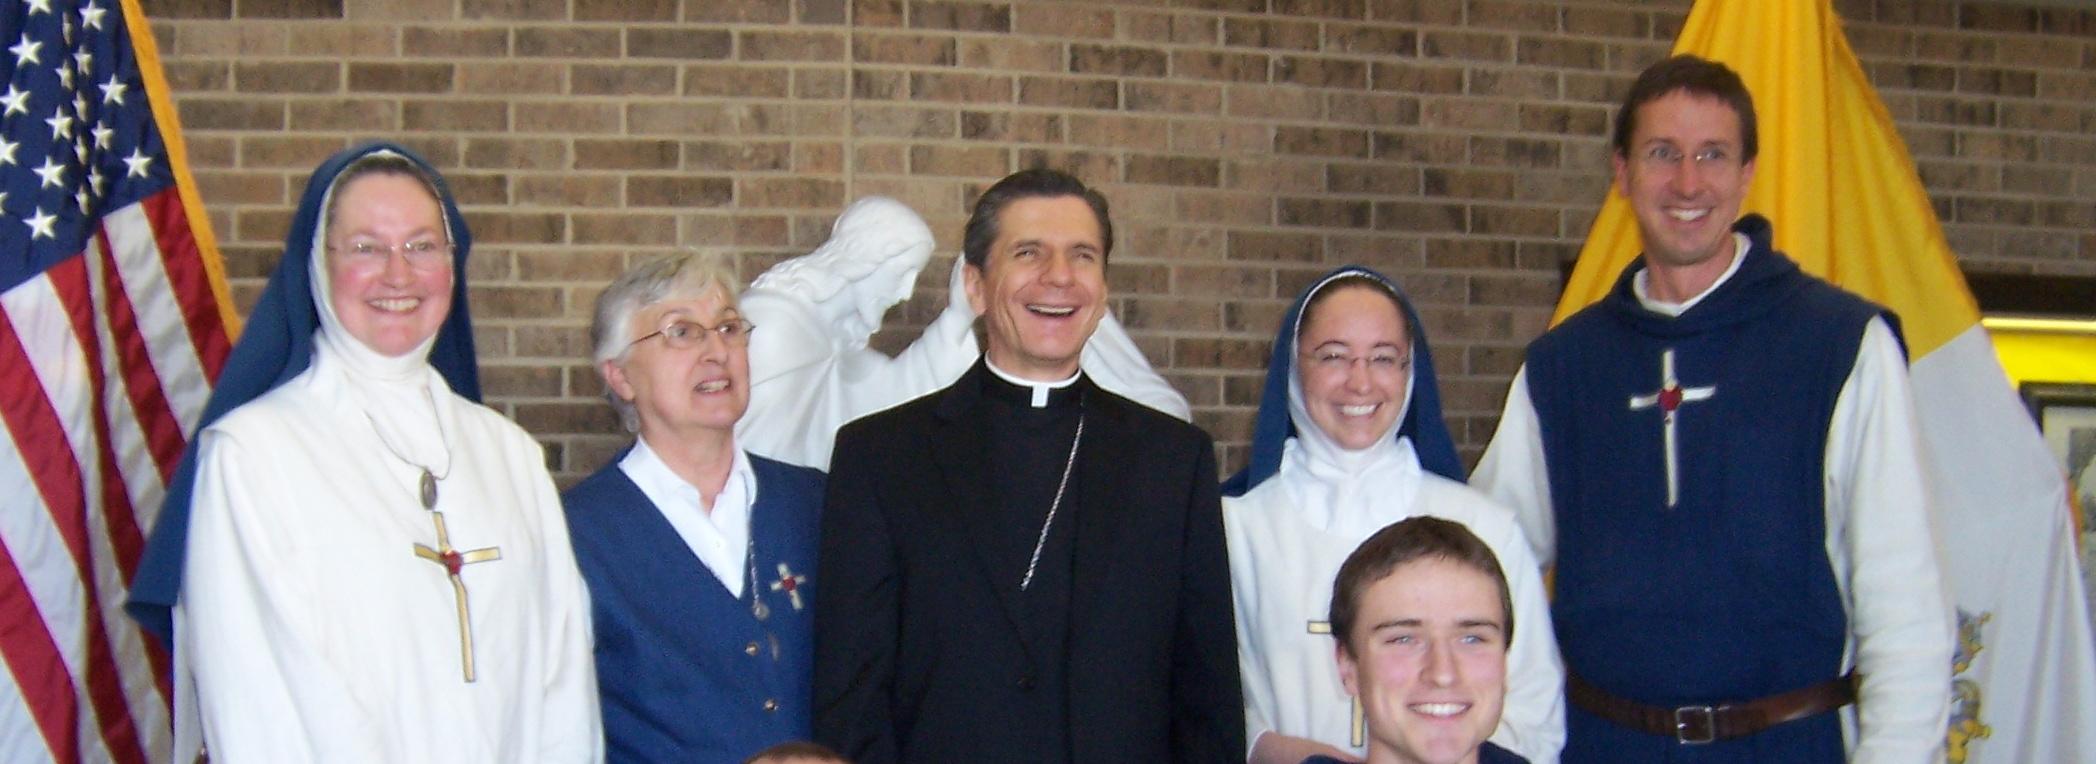 110213 MDM with Archbishop 1.jpg